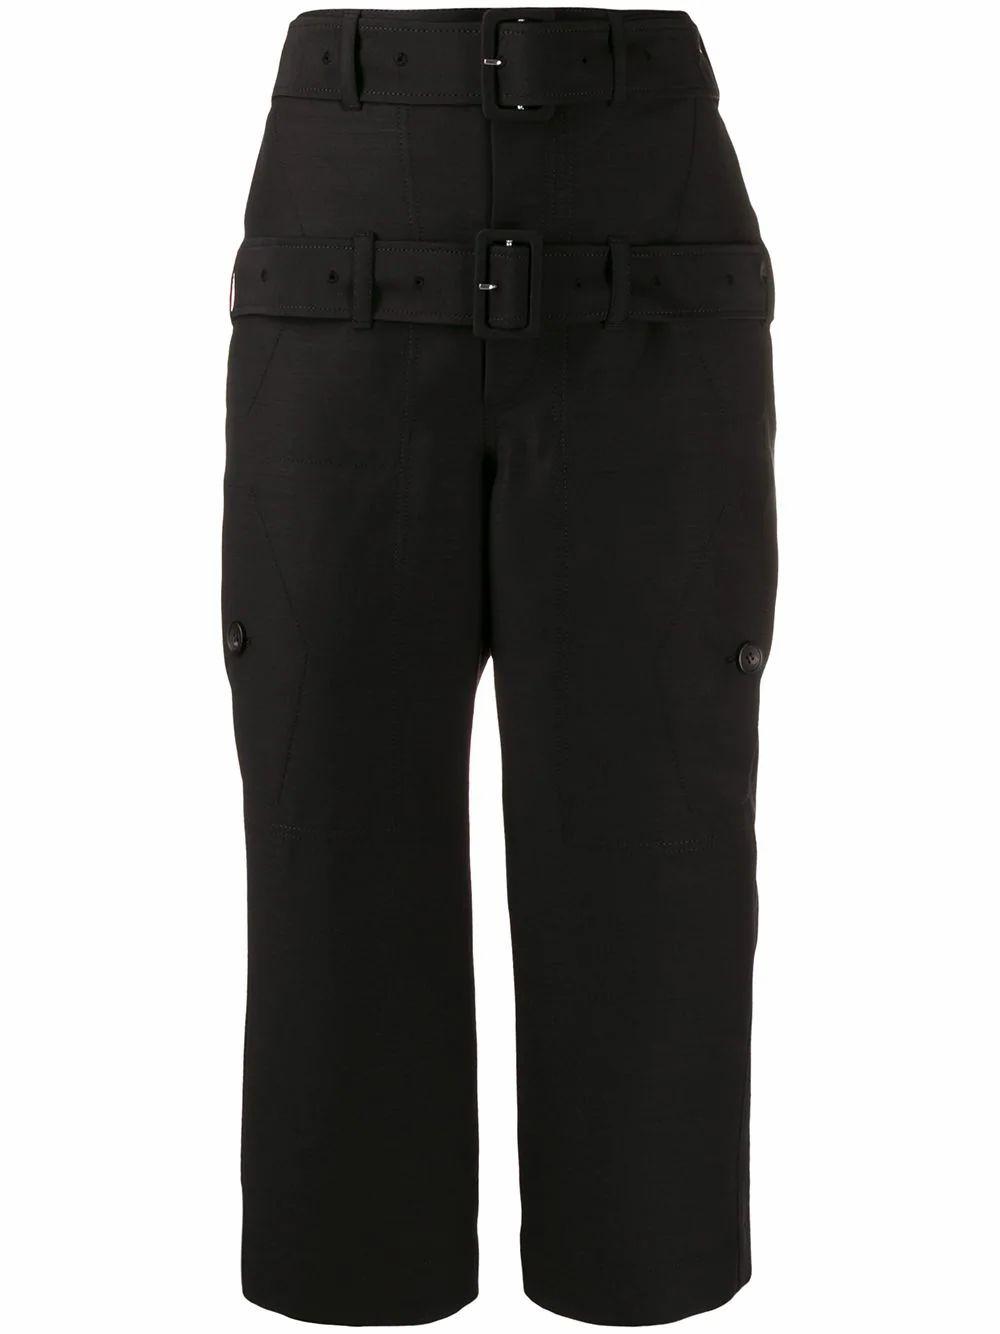 Lanvin LANVIN WOMEN'S BLACK WOOL PANTS